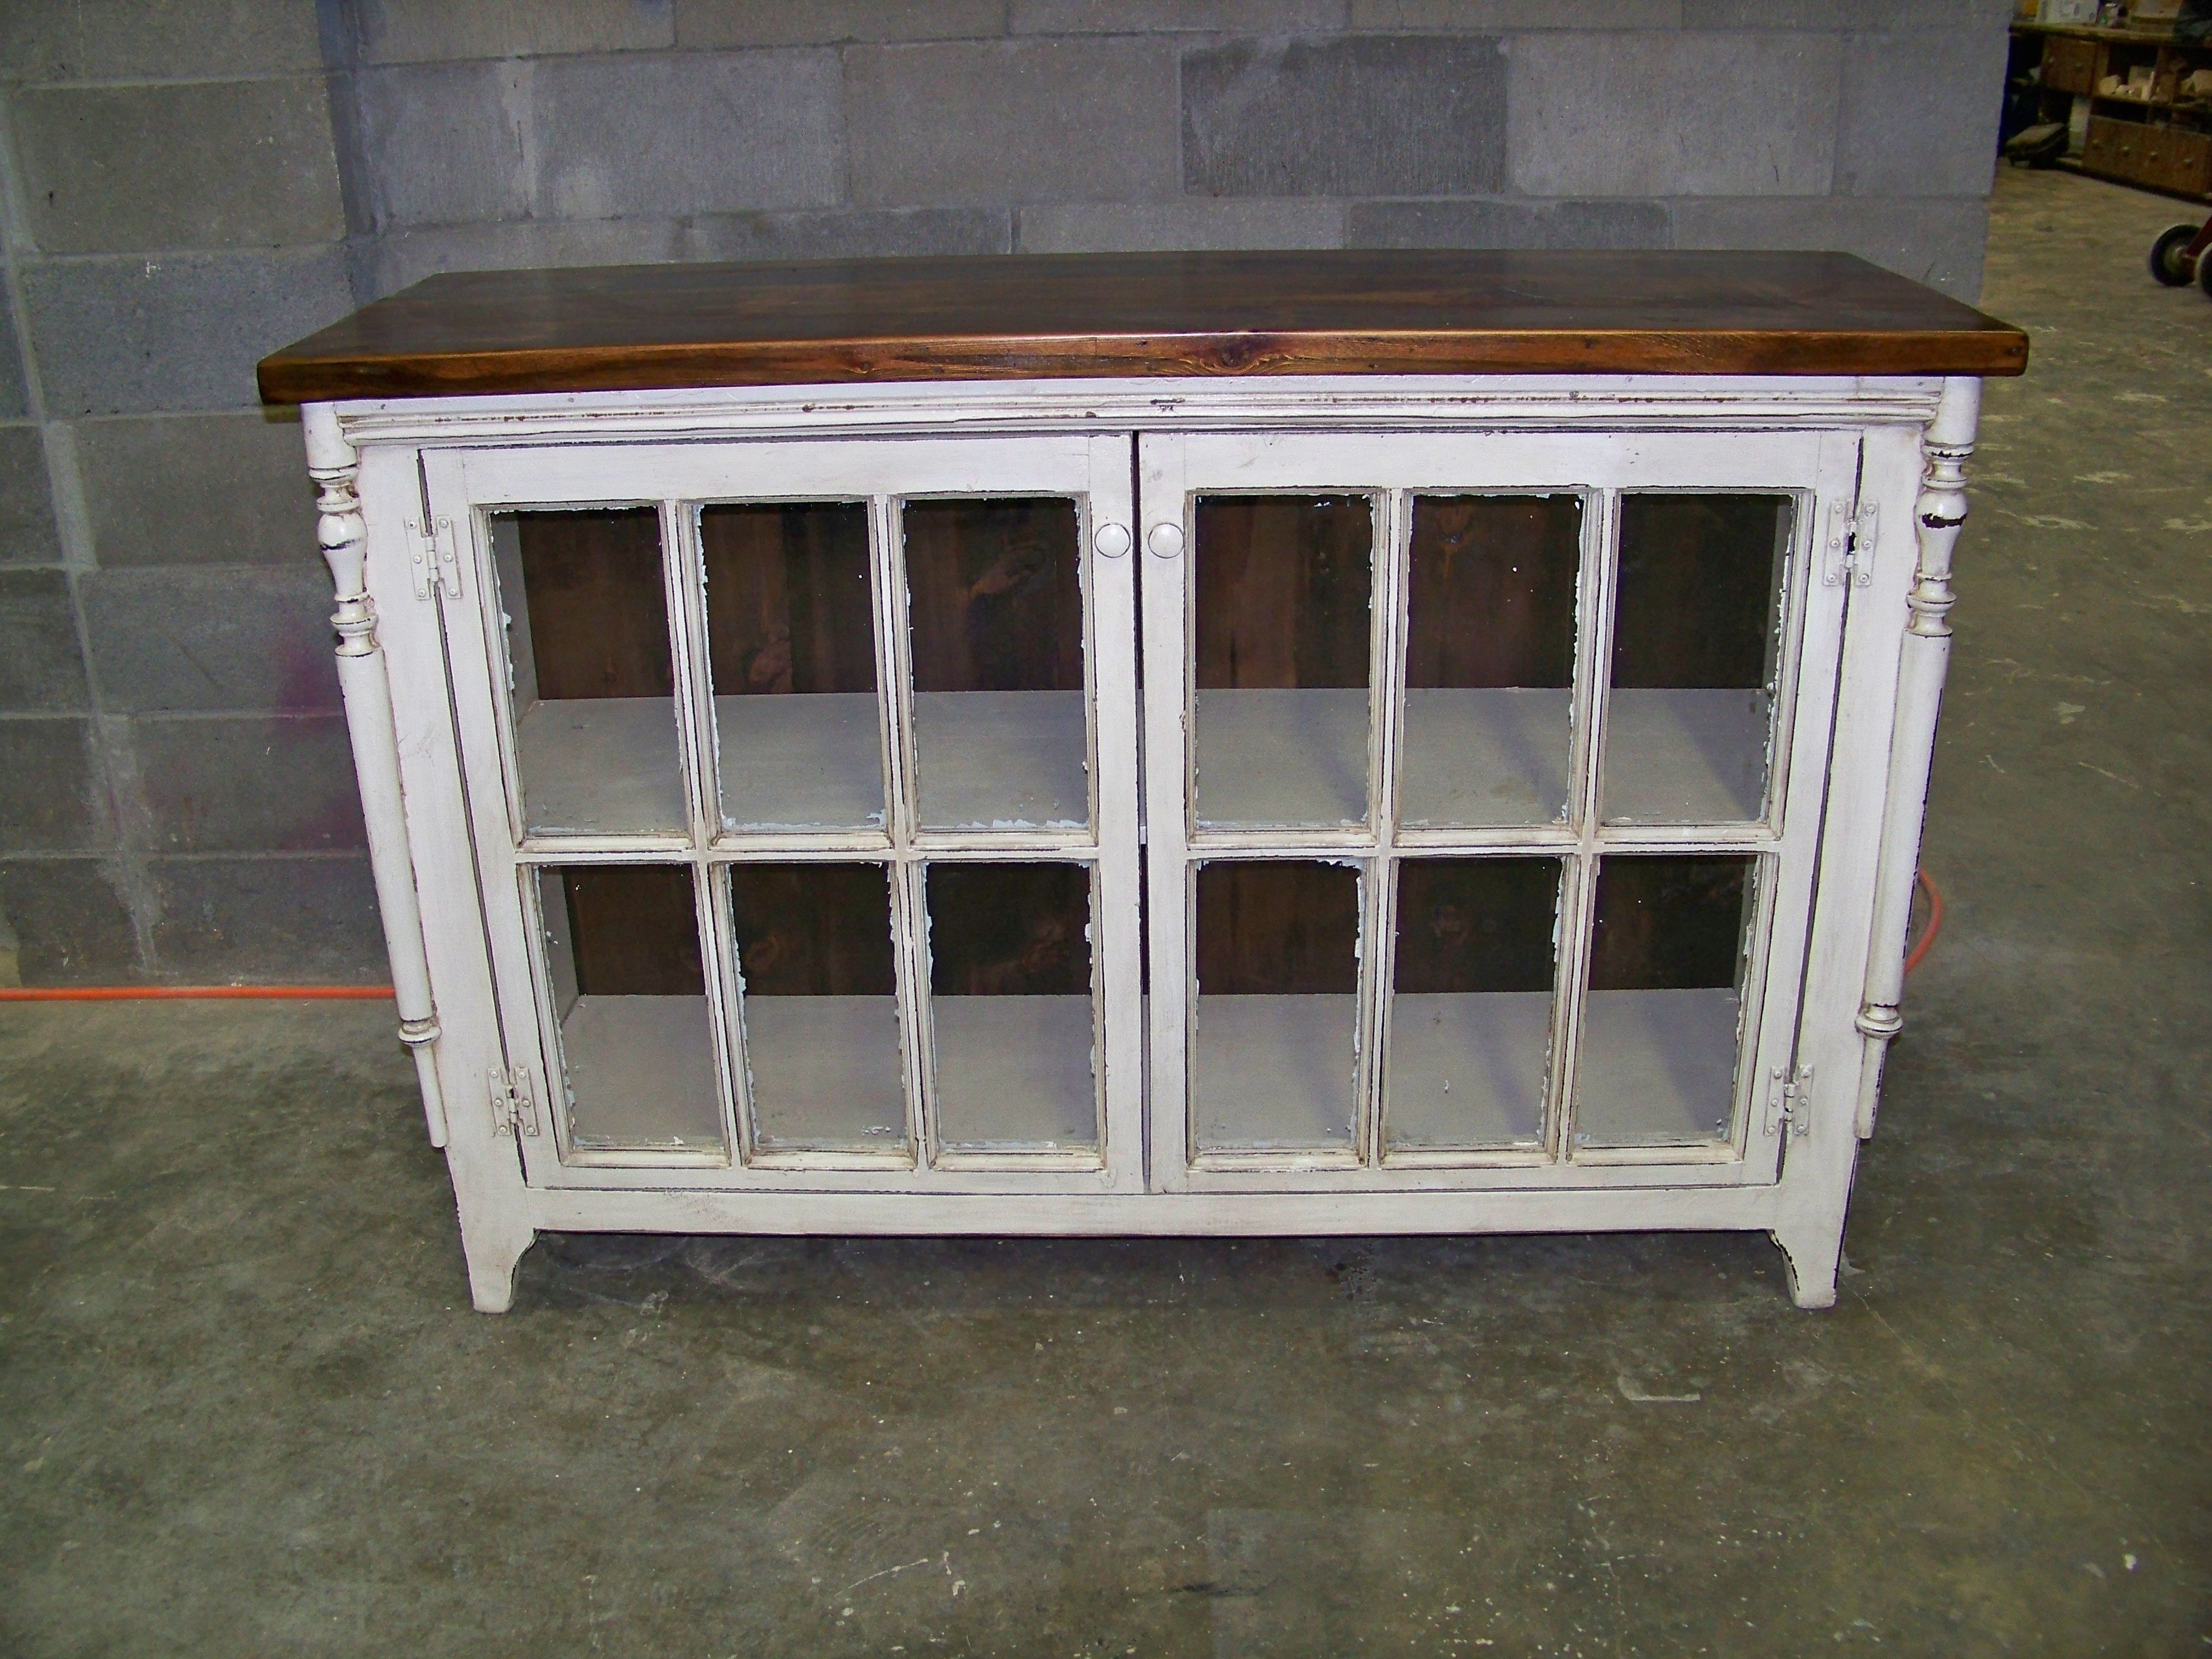 White Stereo Cabinets With Glass Doors Httpfranzdondi